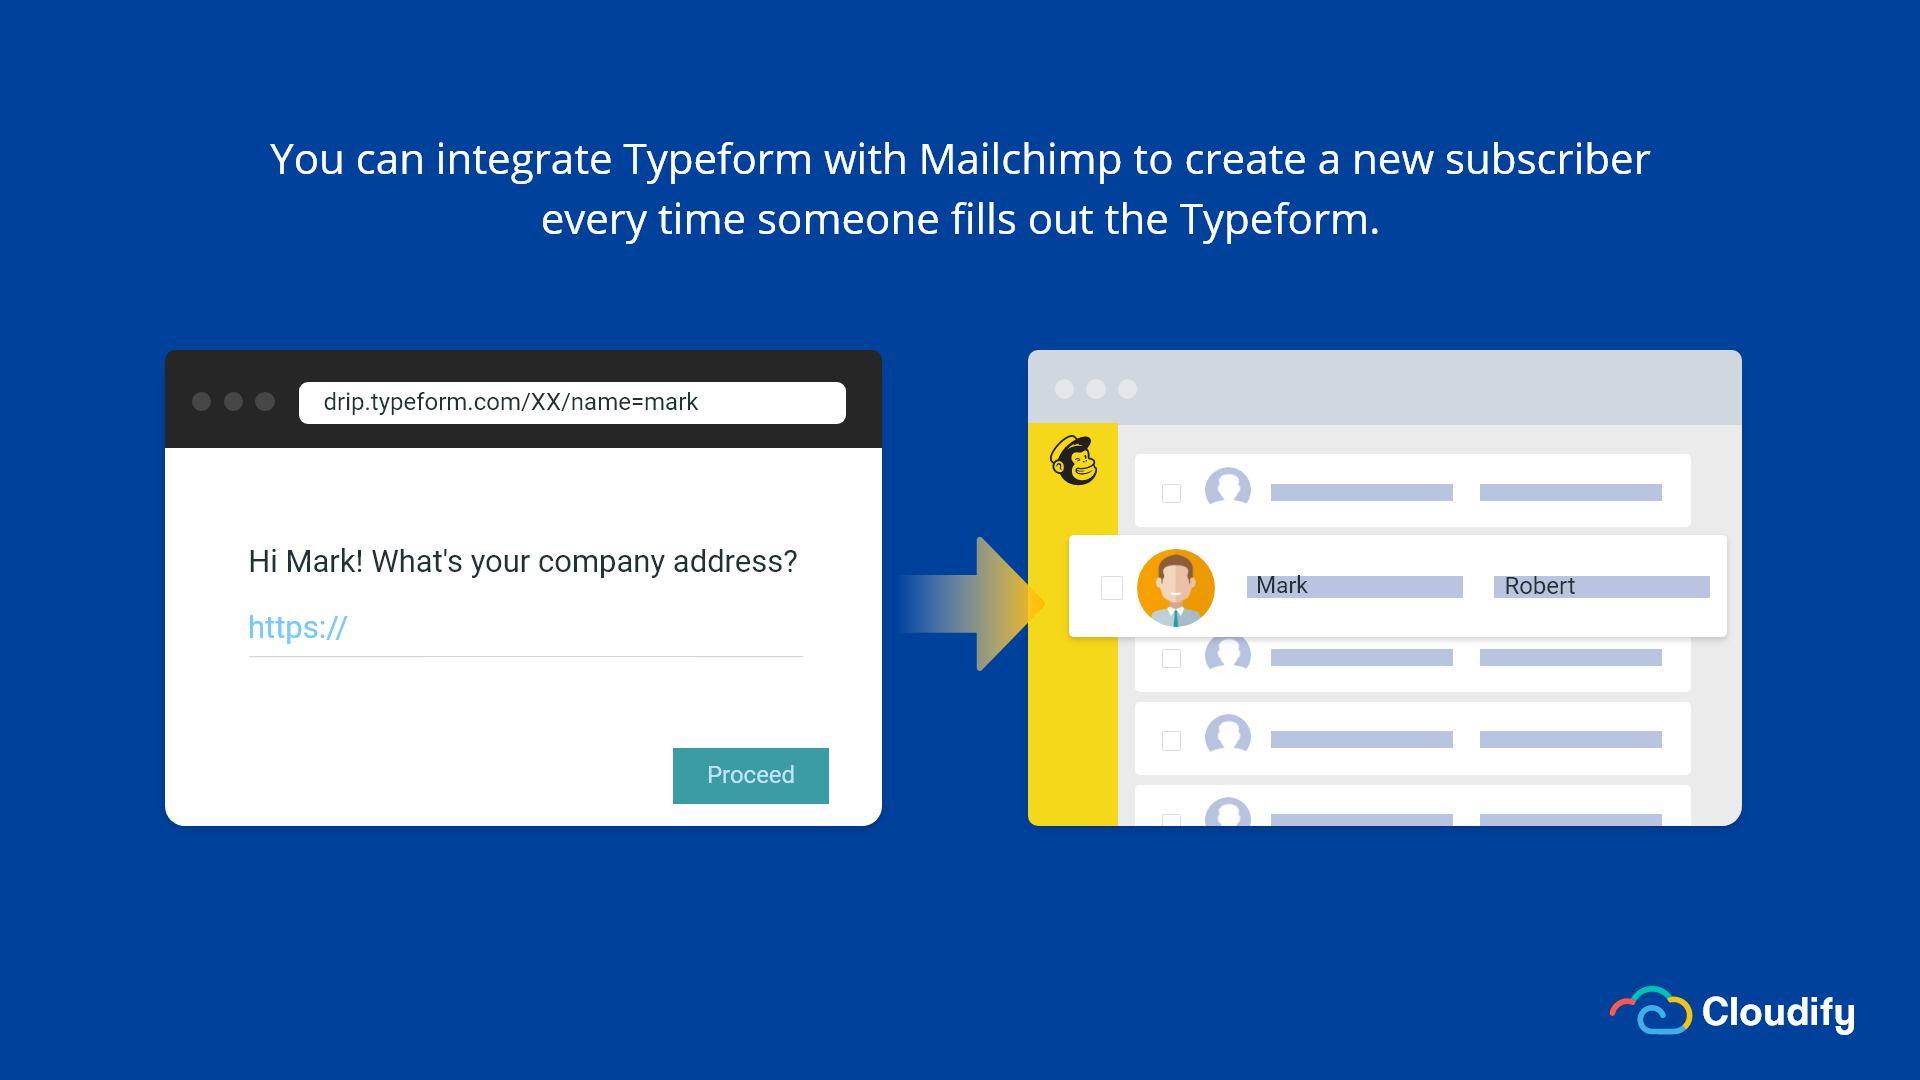 Typeform Mailchimp Integration